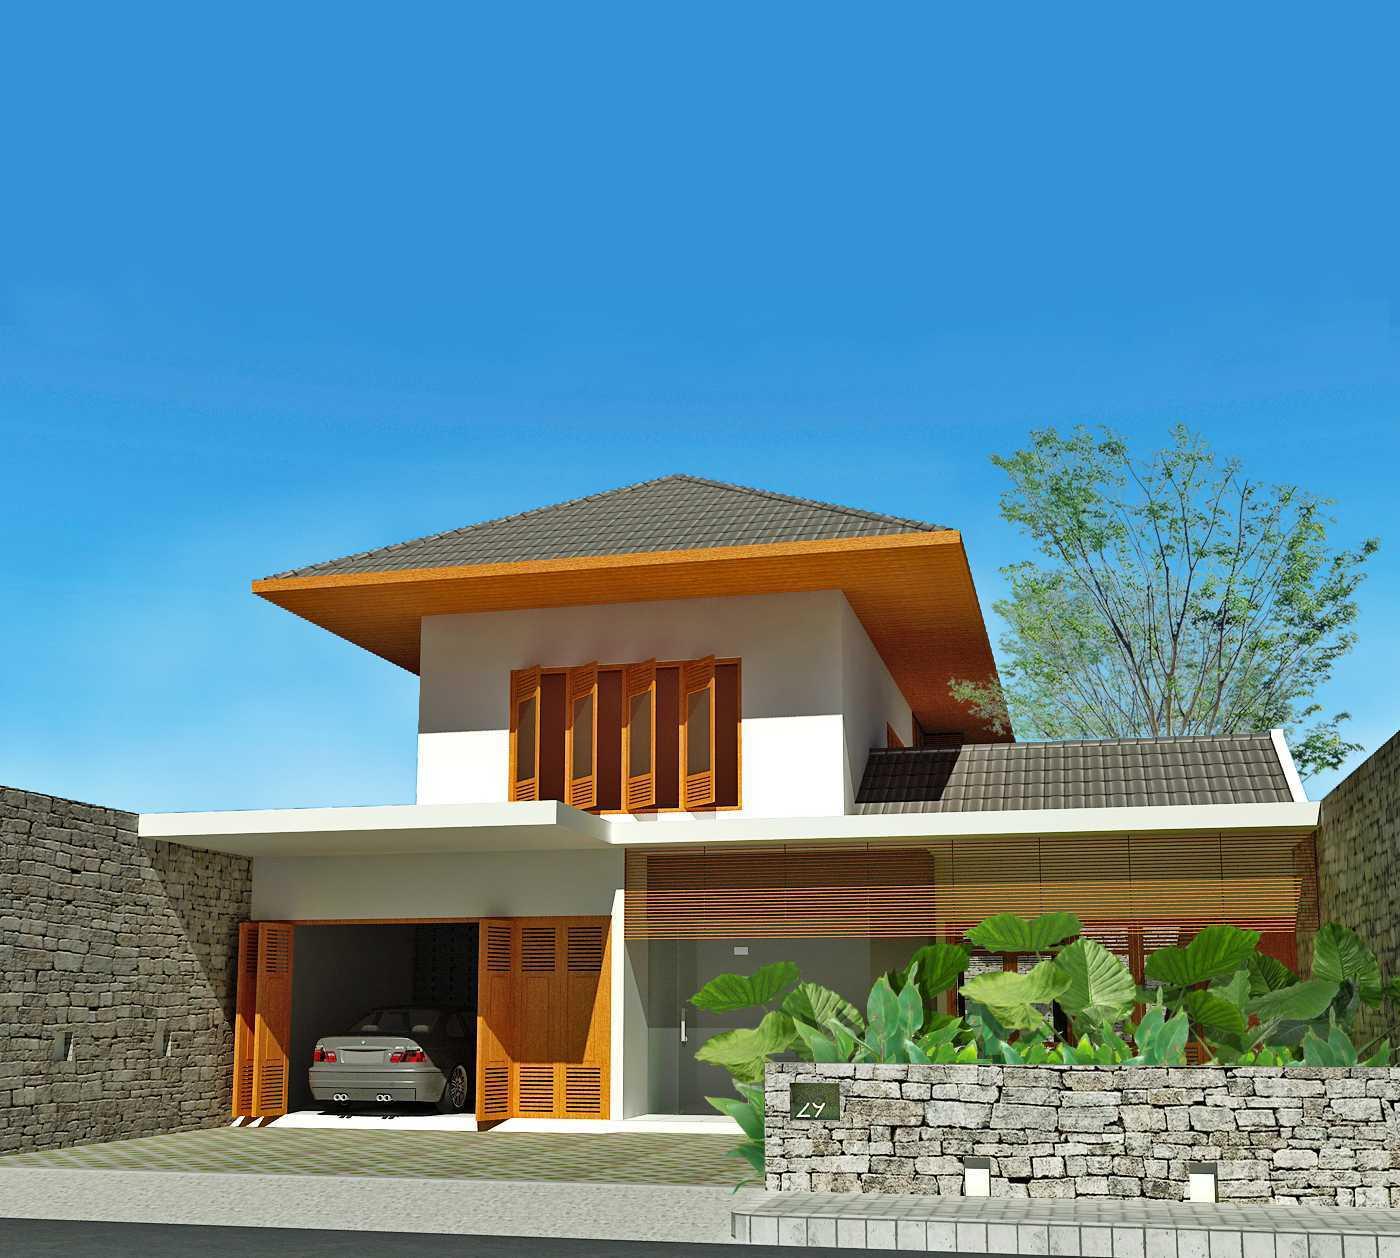 Rerupa Architecture Gito Gati House Yogyakarta, Yogyakarta City, Special Region Of Yogyakarta, Indonesia Yogyakarta City, Special Region Of Yogyakarta, Indonesia Fix-Arief-11D  32782